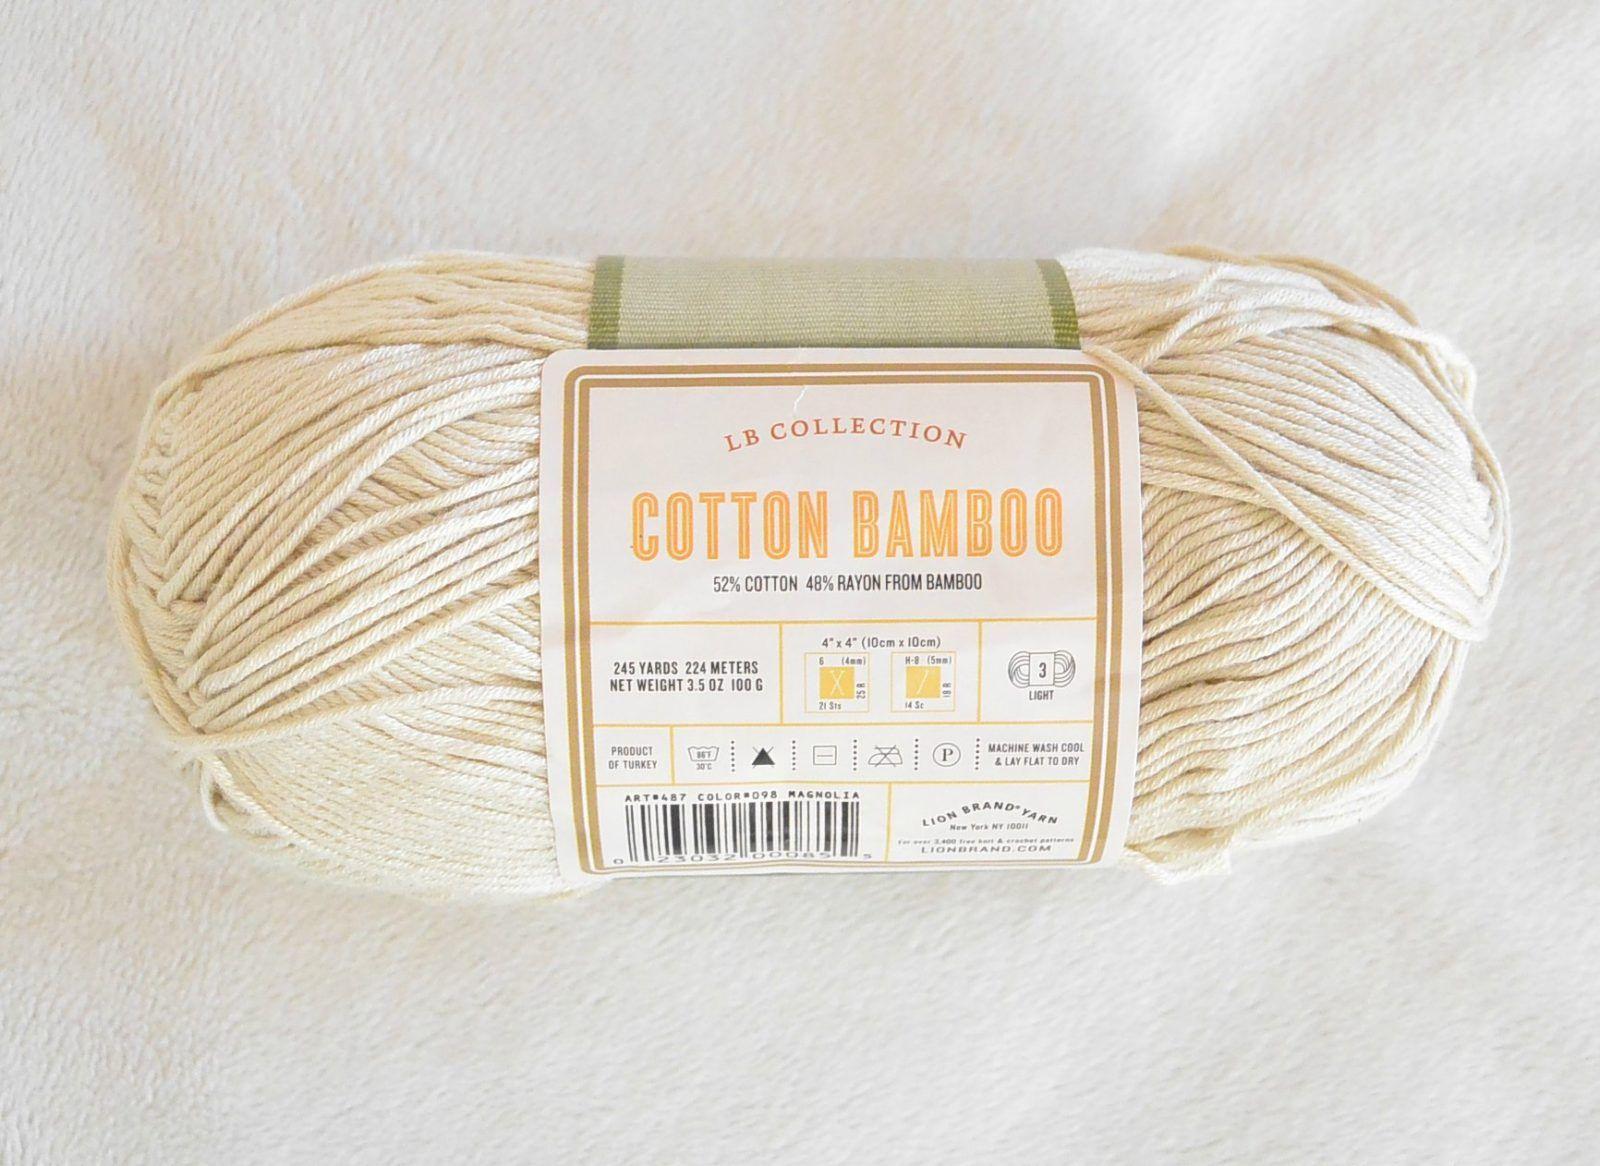 Easy Knit Top Cotton Lion Brand Yarn | Rosalia Ingram ღ OC ...